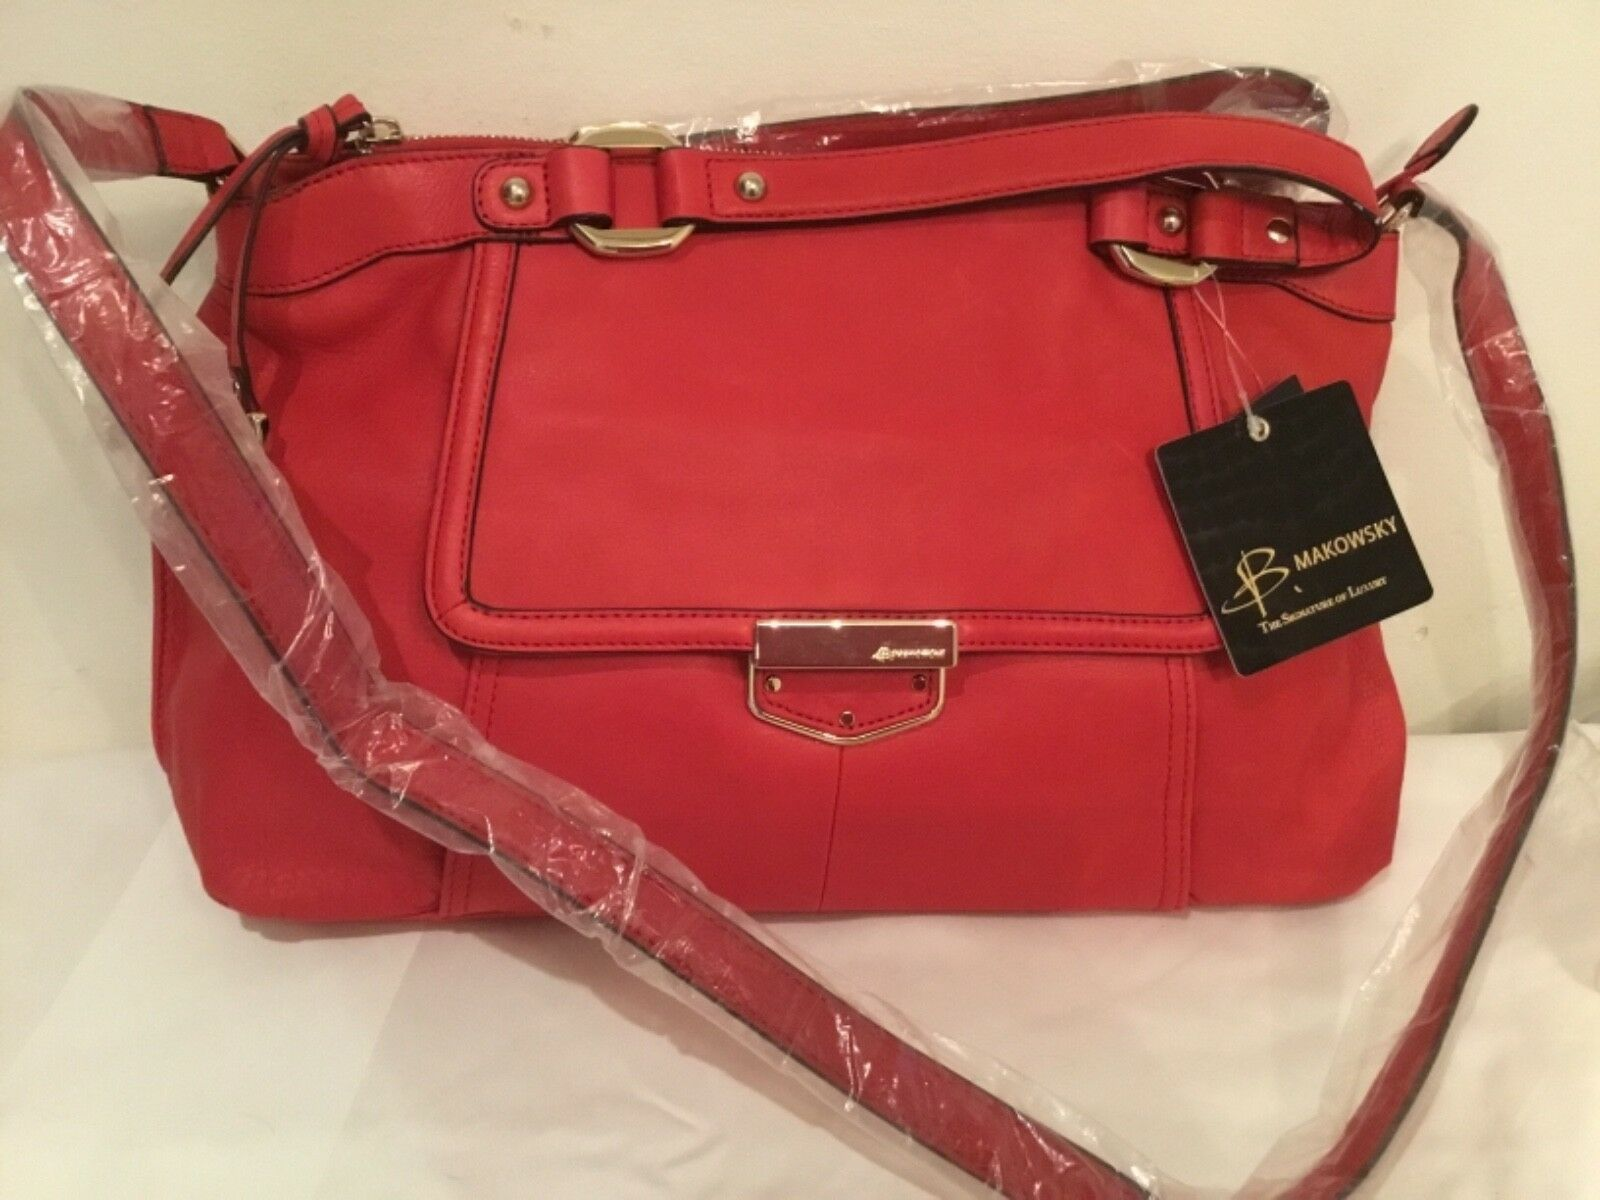 B. Makowsky Lombard Satchel With Crossbody Strap Strap Strap Bag - rot | Niedrige Kosten  | Verkauf Online-Shop  | Günstig  e08d22